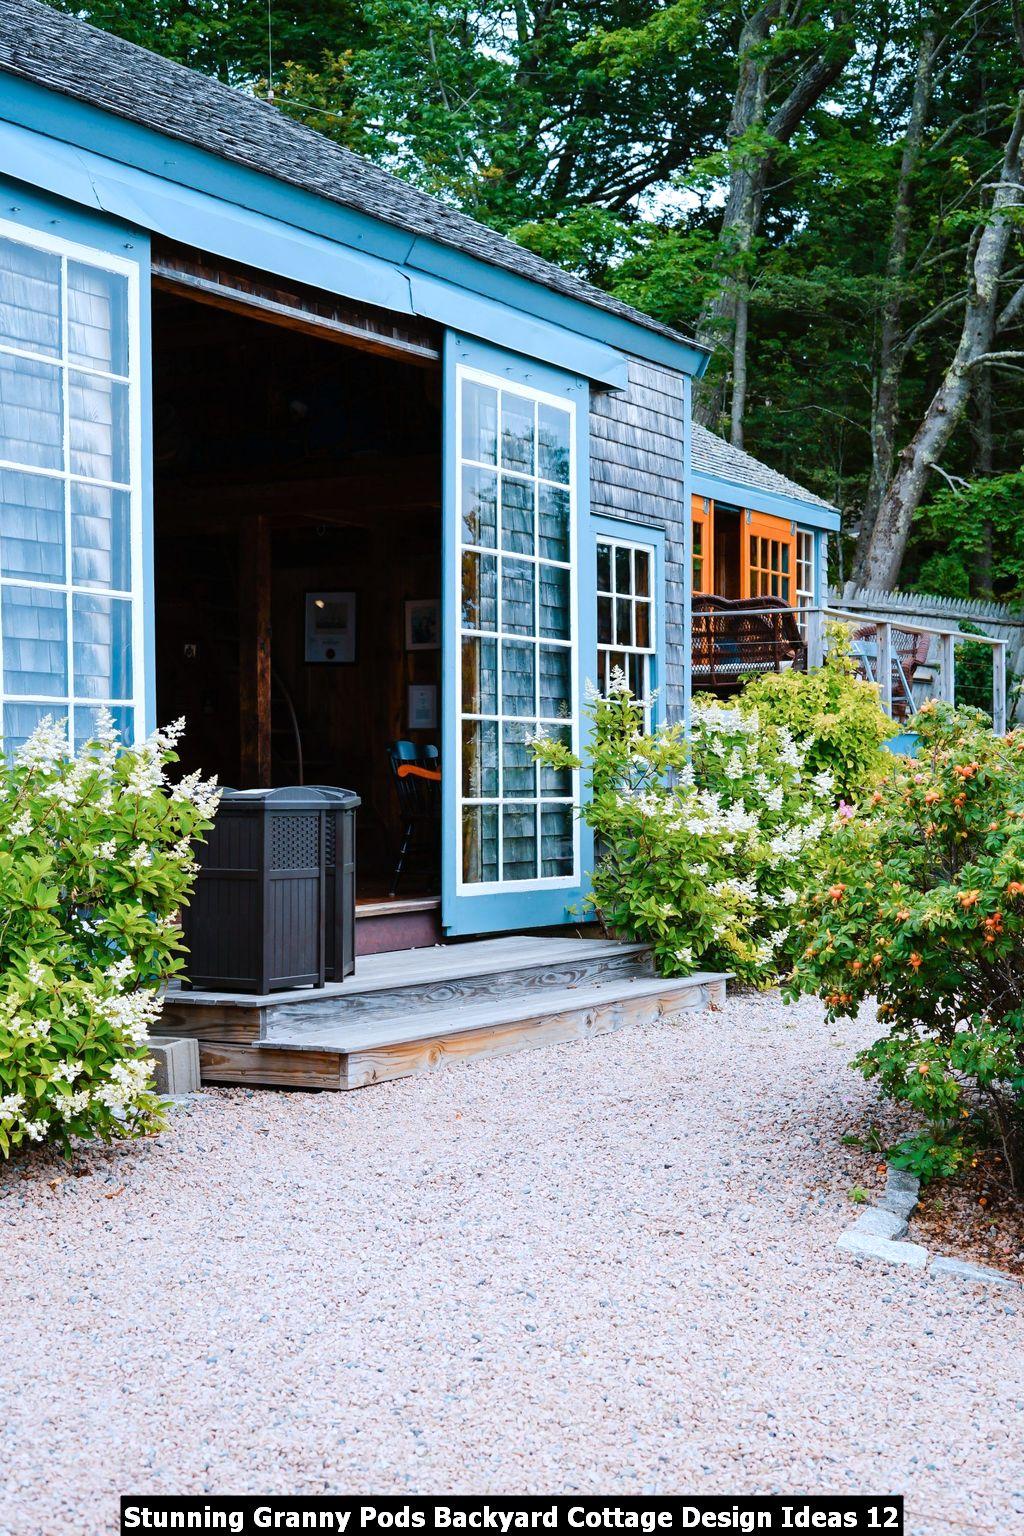 Stunning Granny Pods Backyard Cottage Design Ideas 12